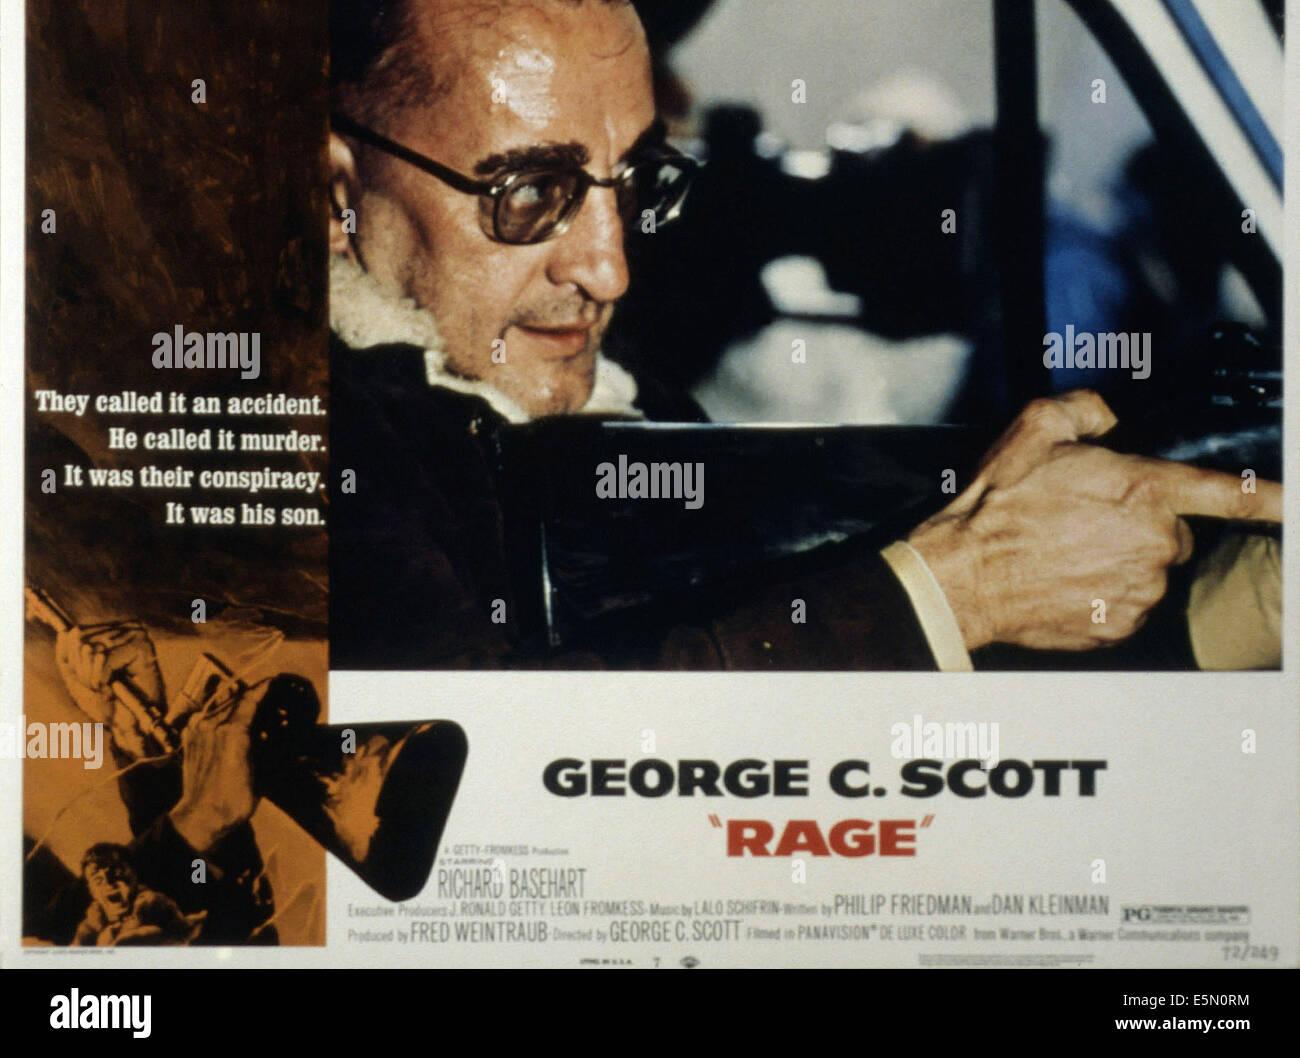 RAGE, George C. Scott, 1972 - Stock Image